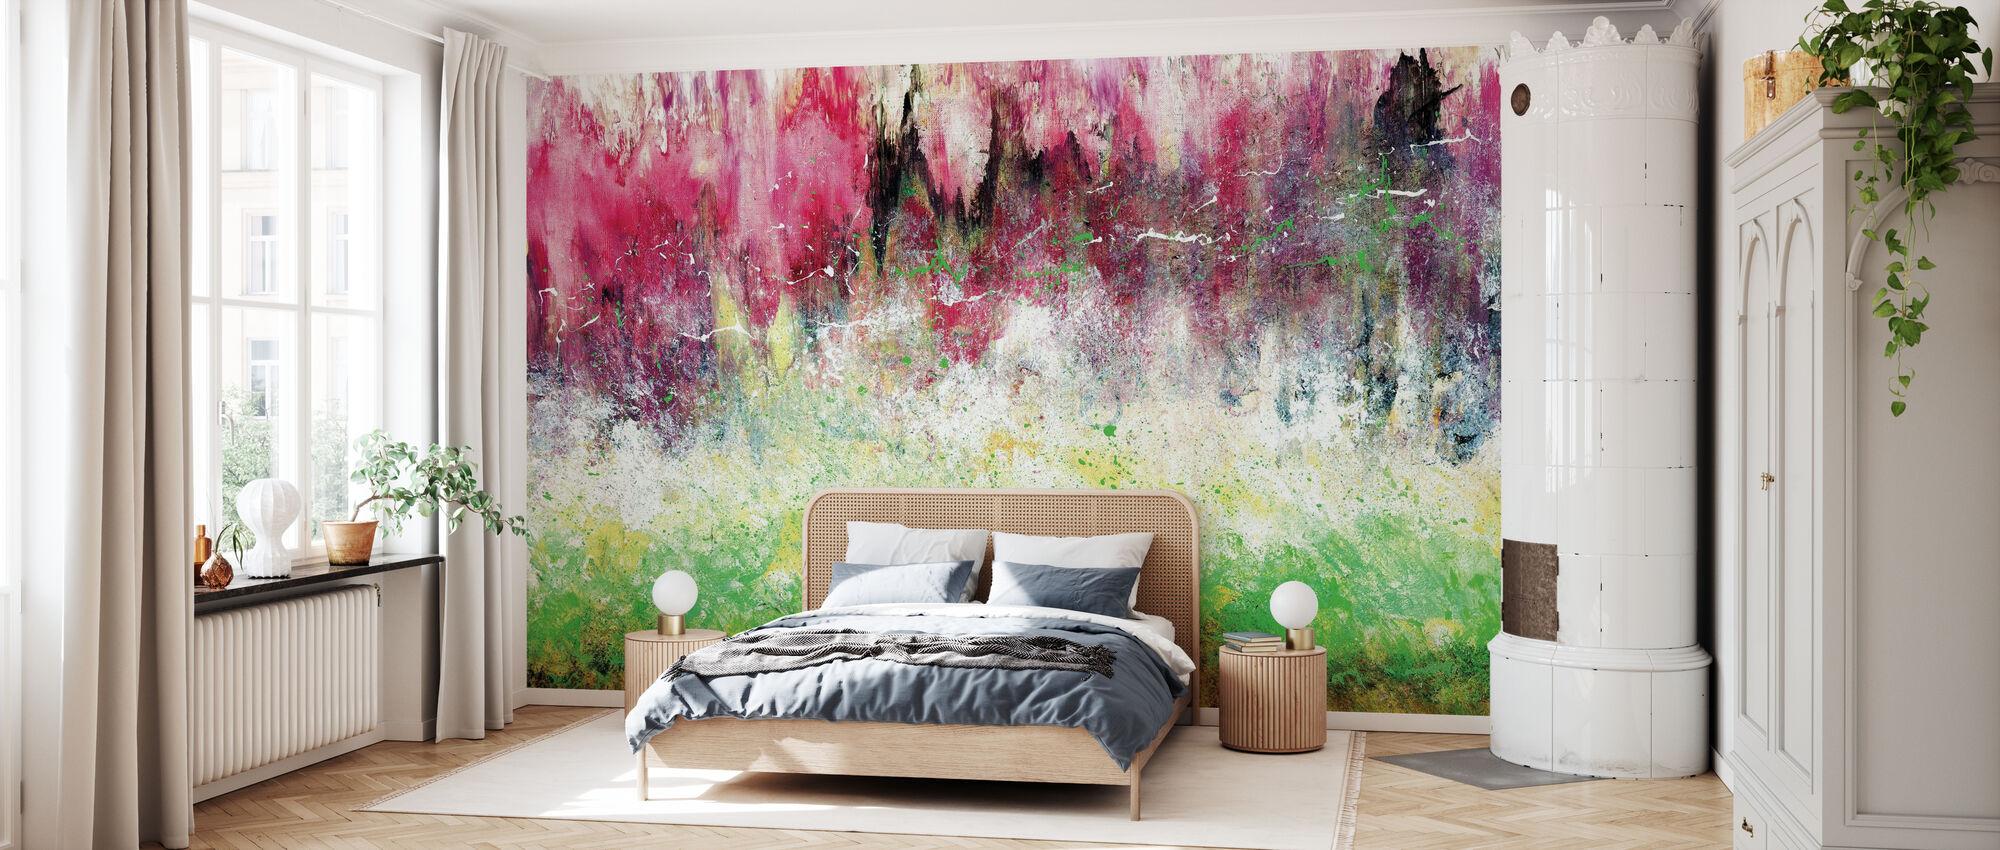 Sweet Dreams - Wallpaper - Bedroom